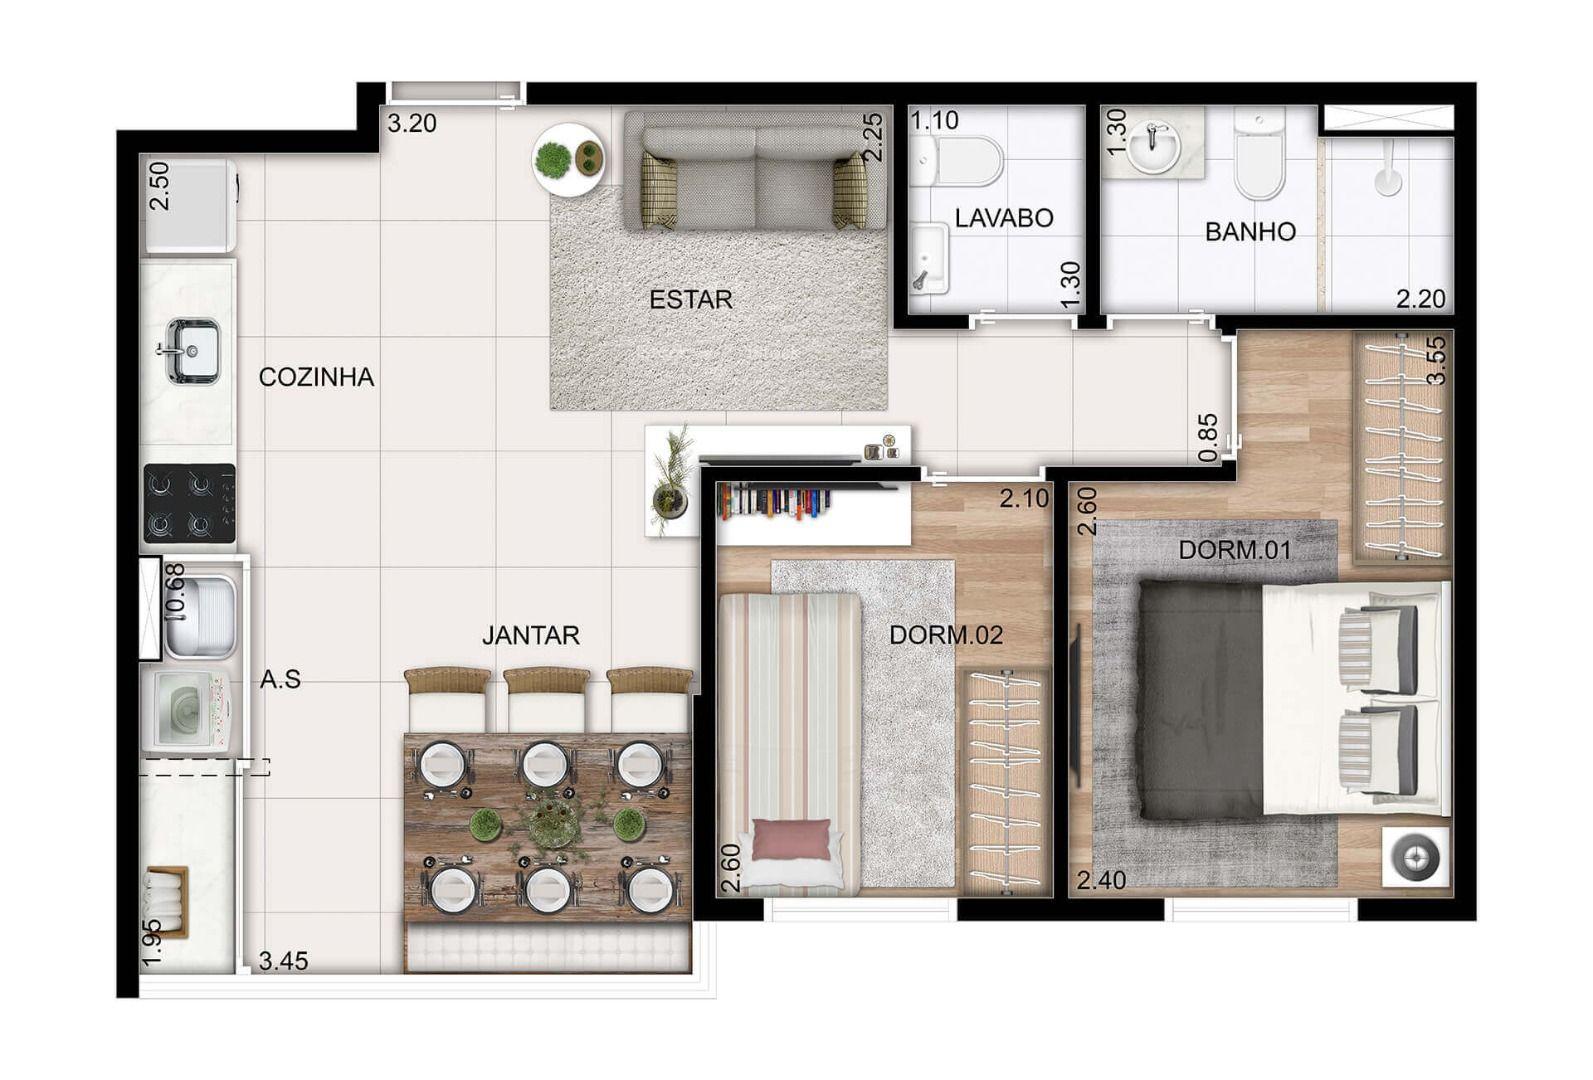 Planta do Ideale Locan. floorplan